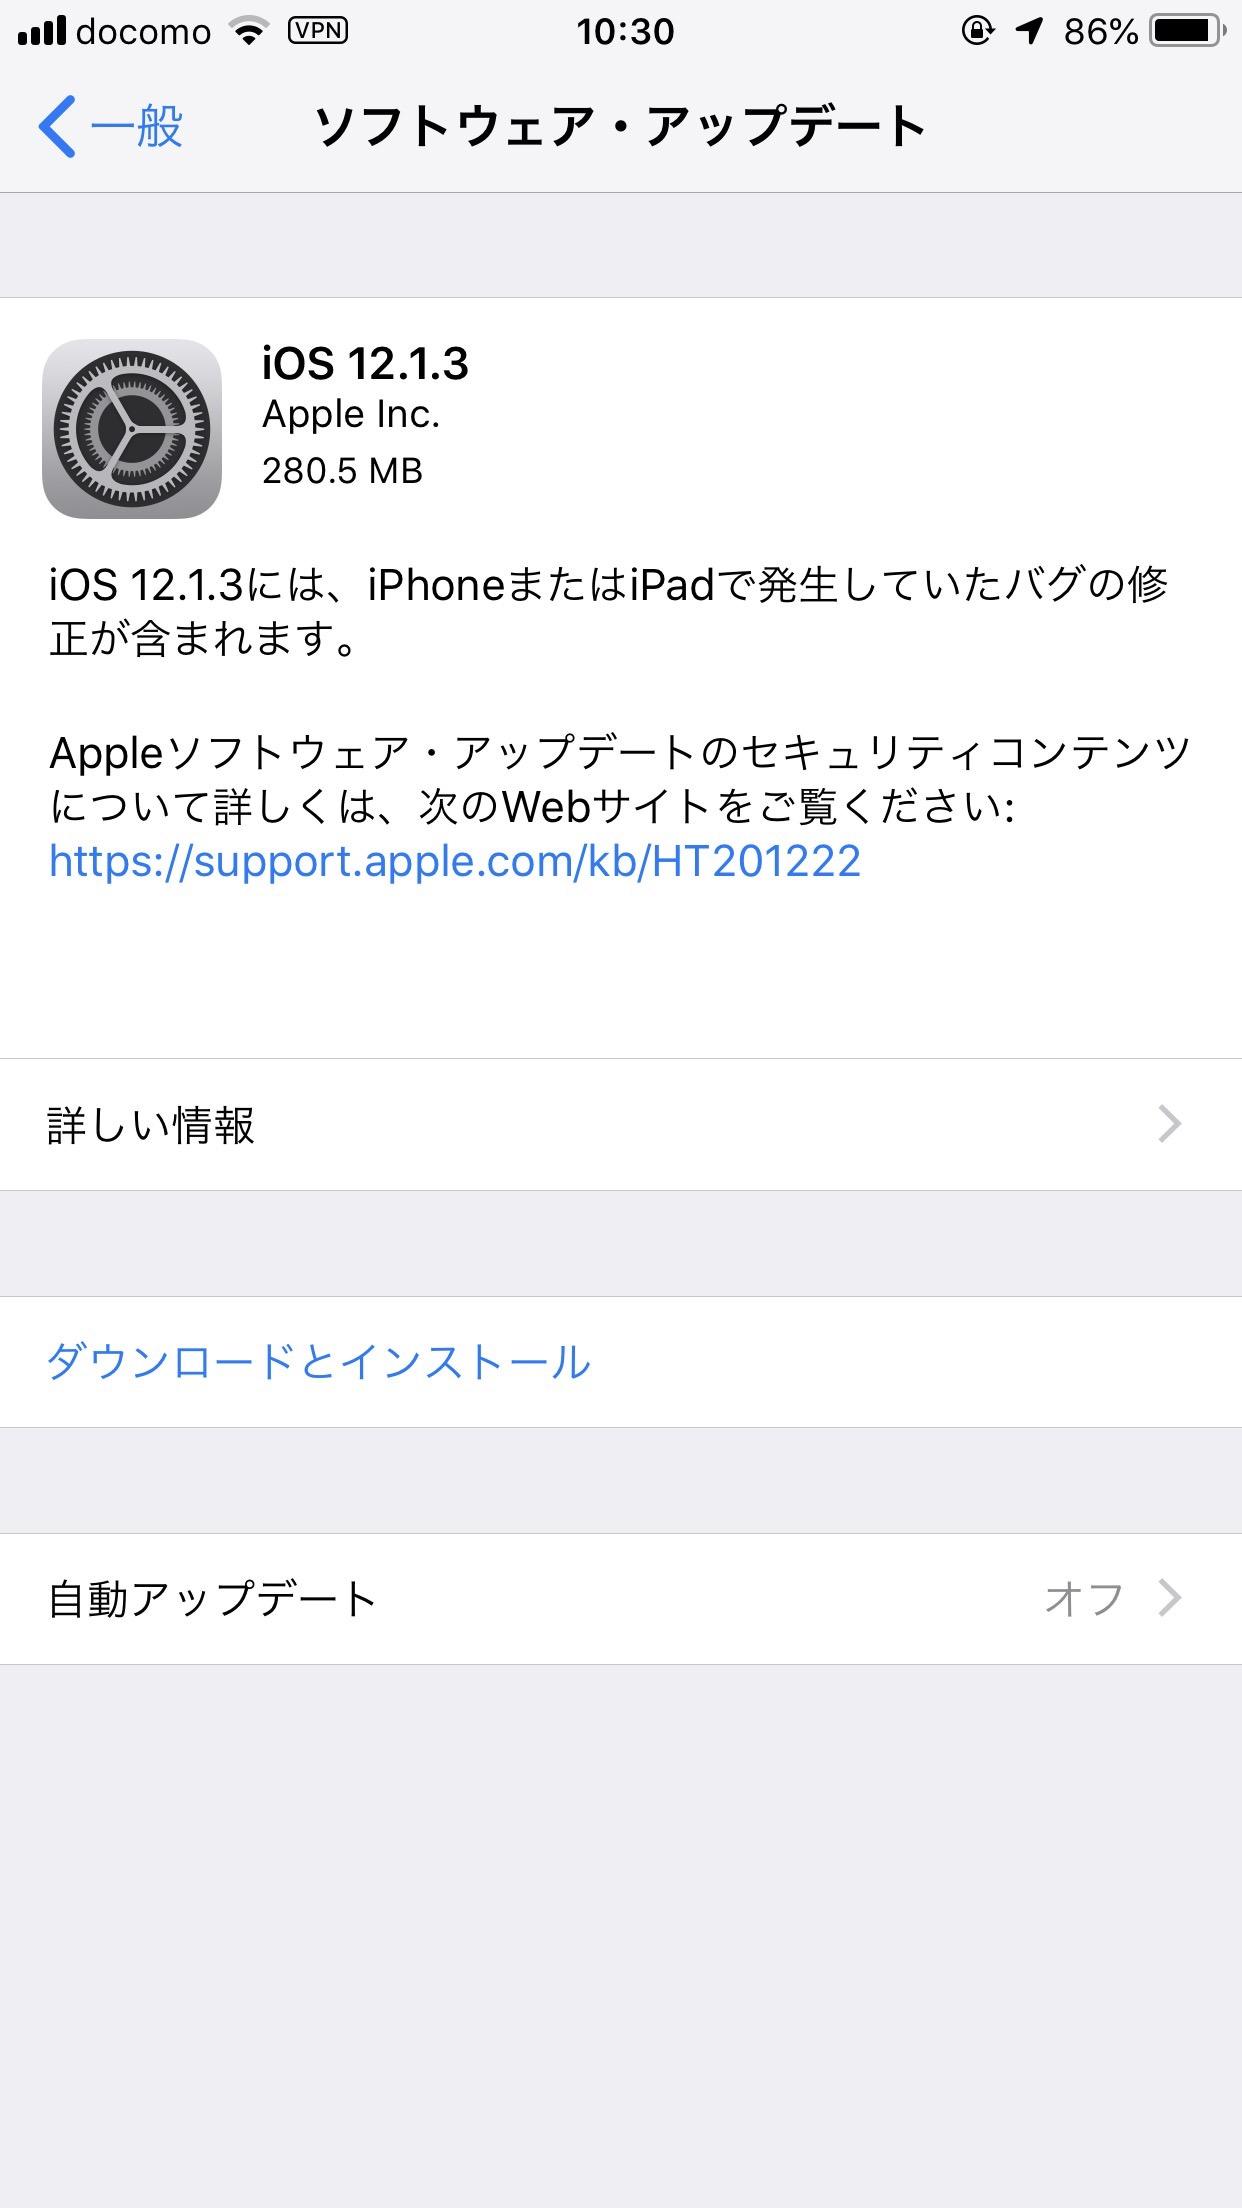 【iOS 12】「iOS 12.1.3ソフトウェアアップデート」リリース